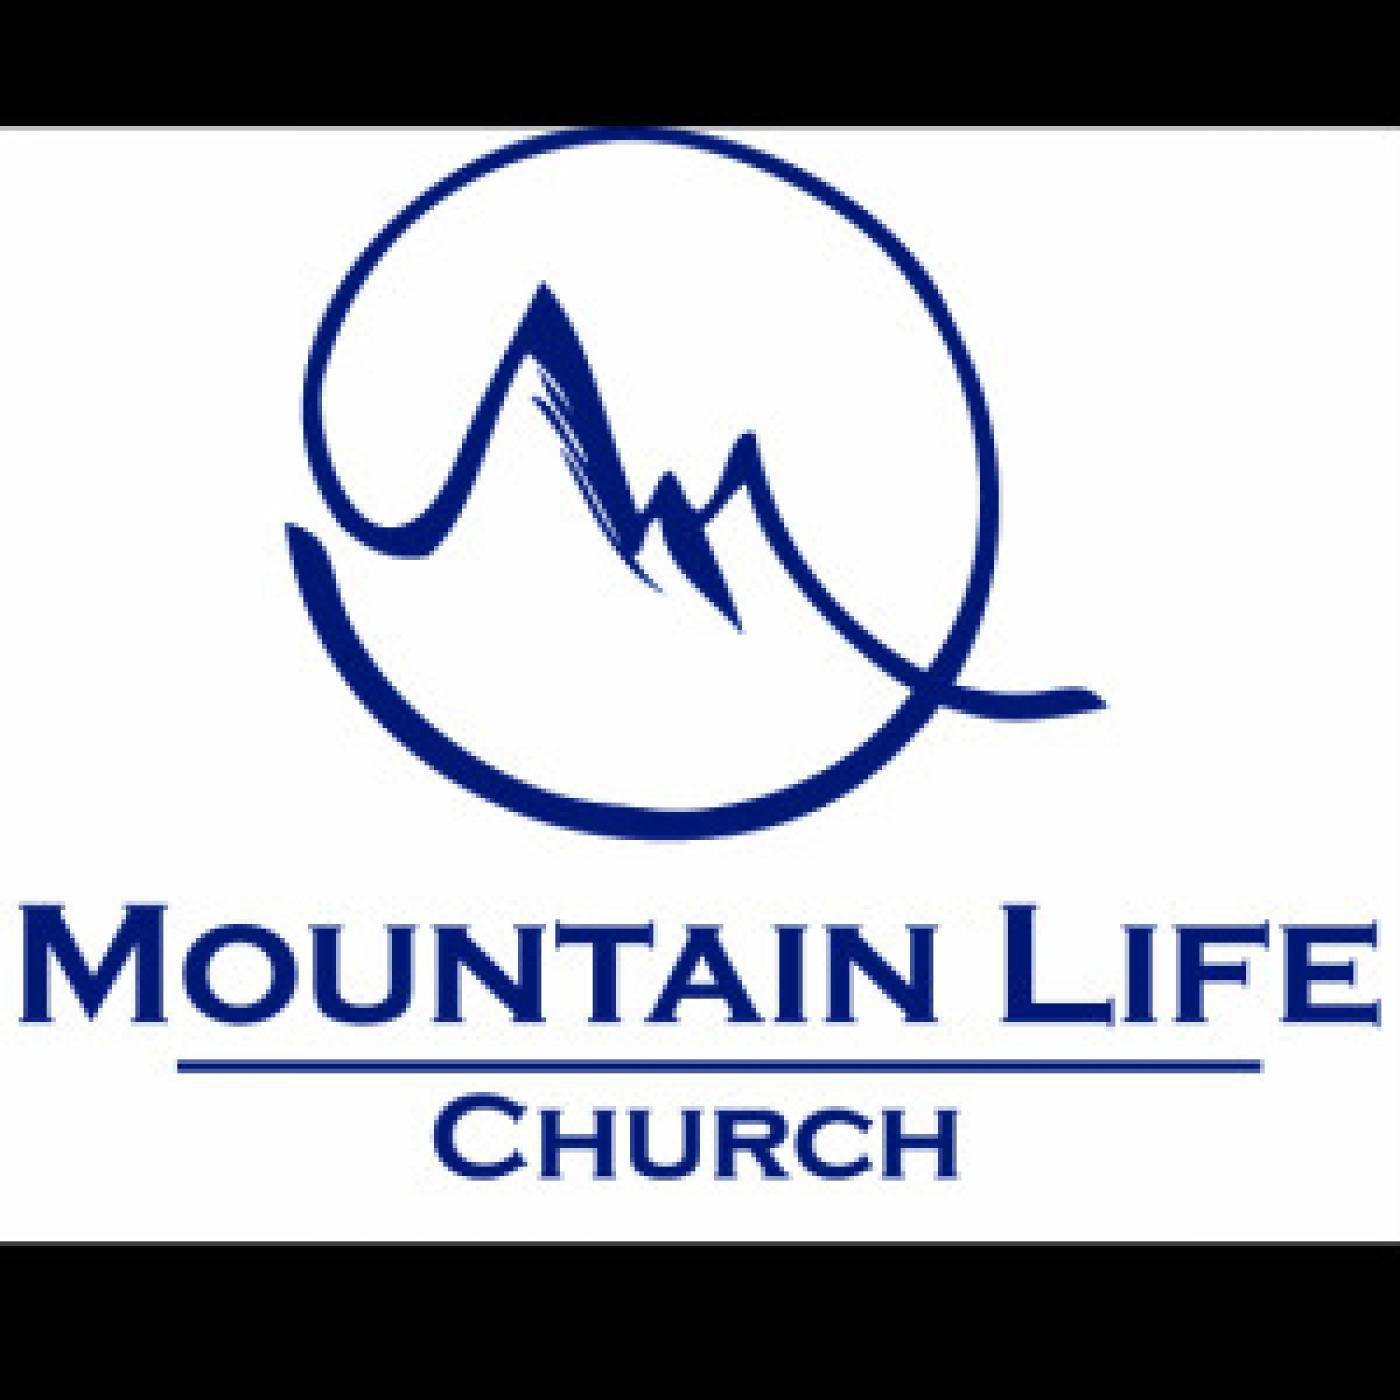 Mountain Life Church